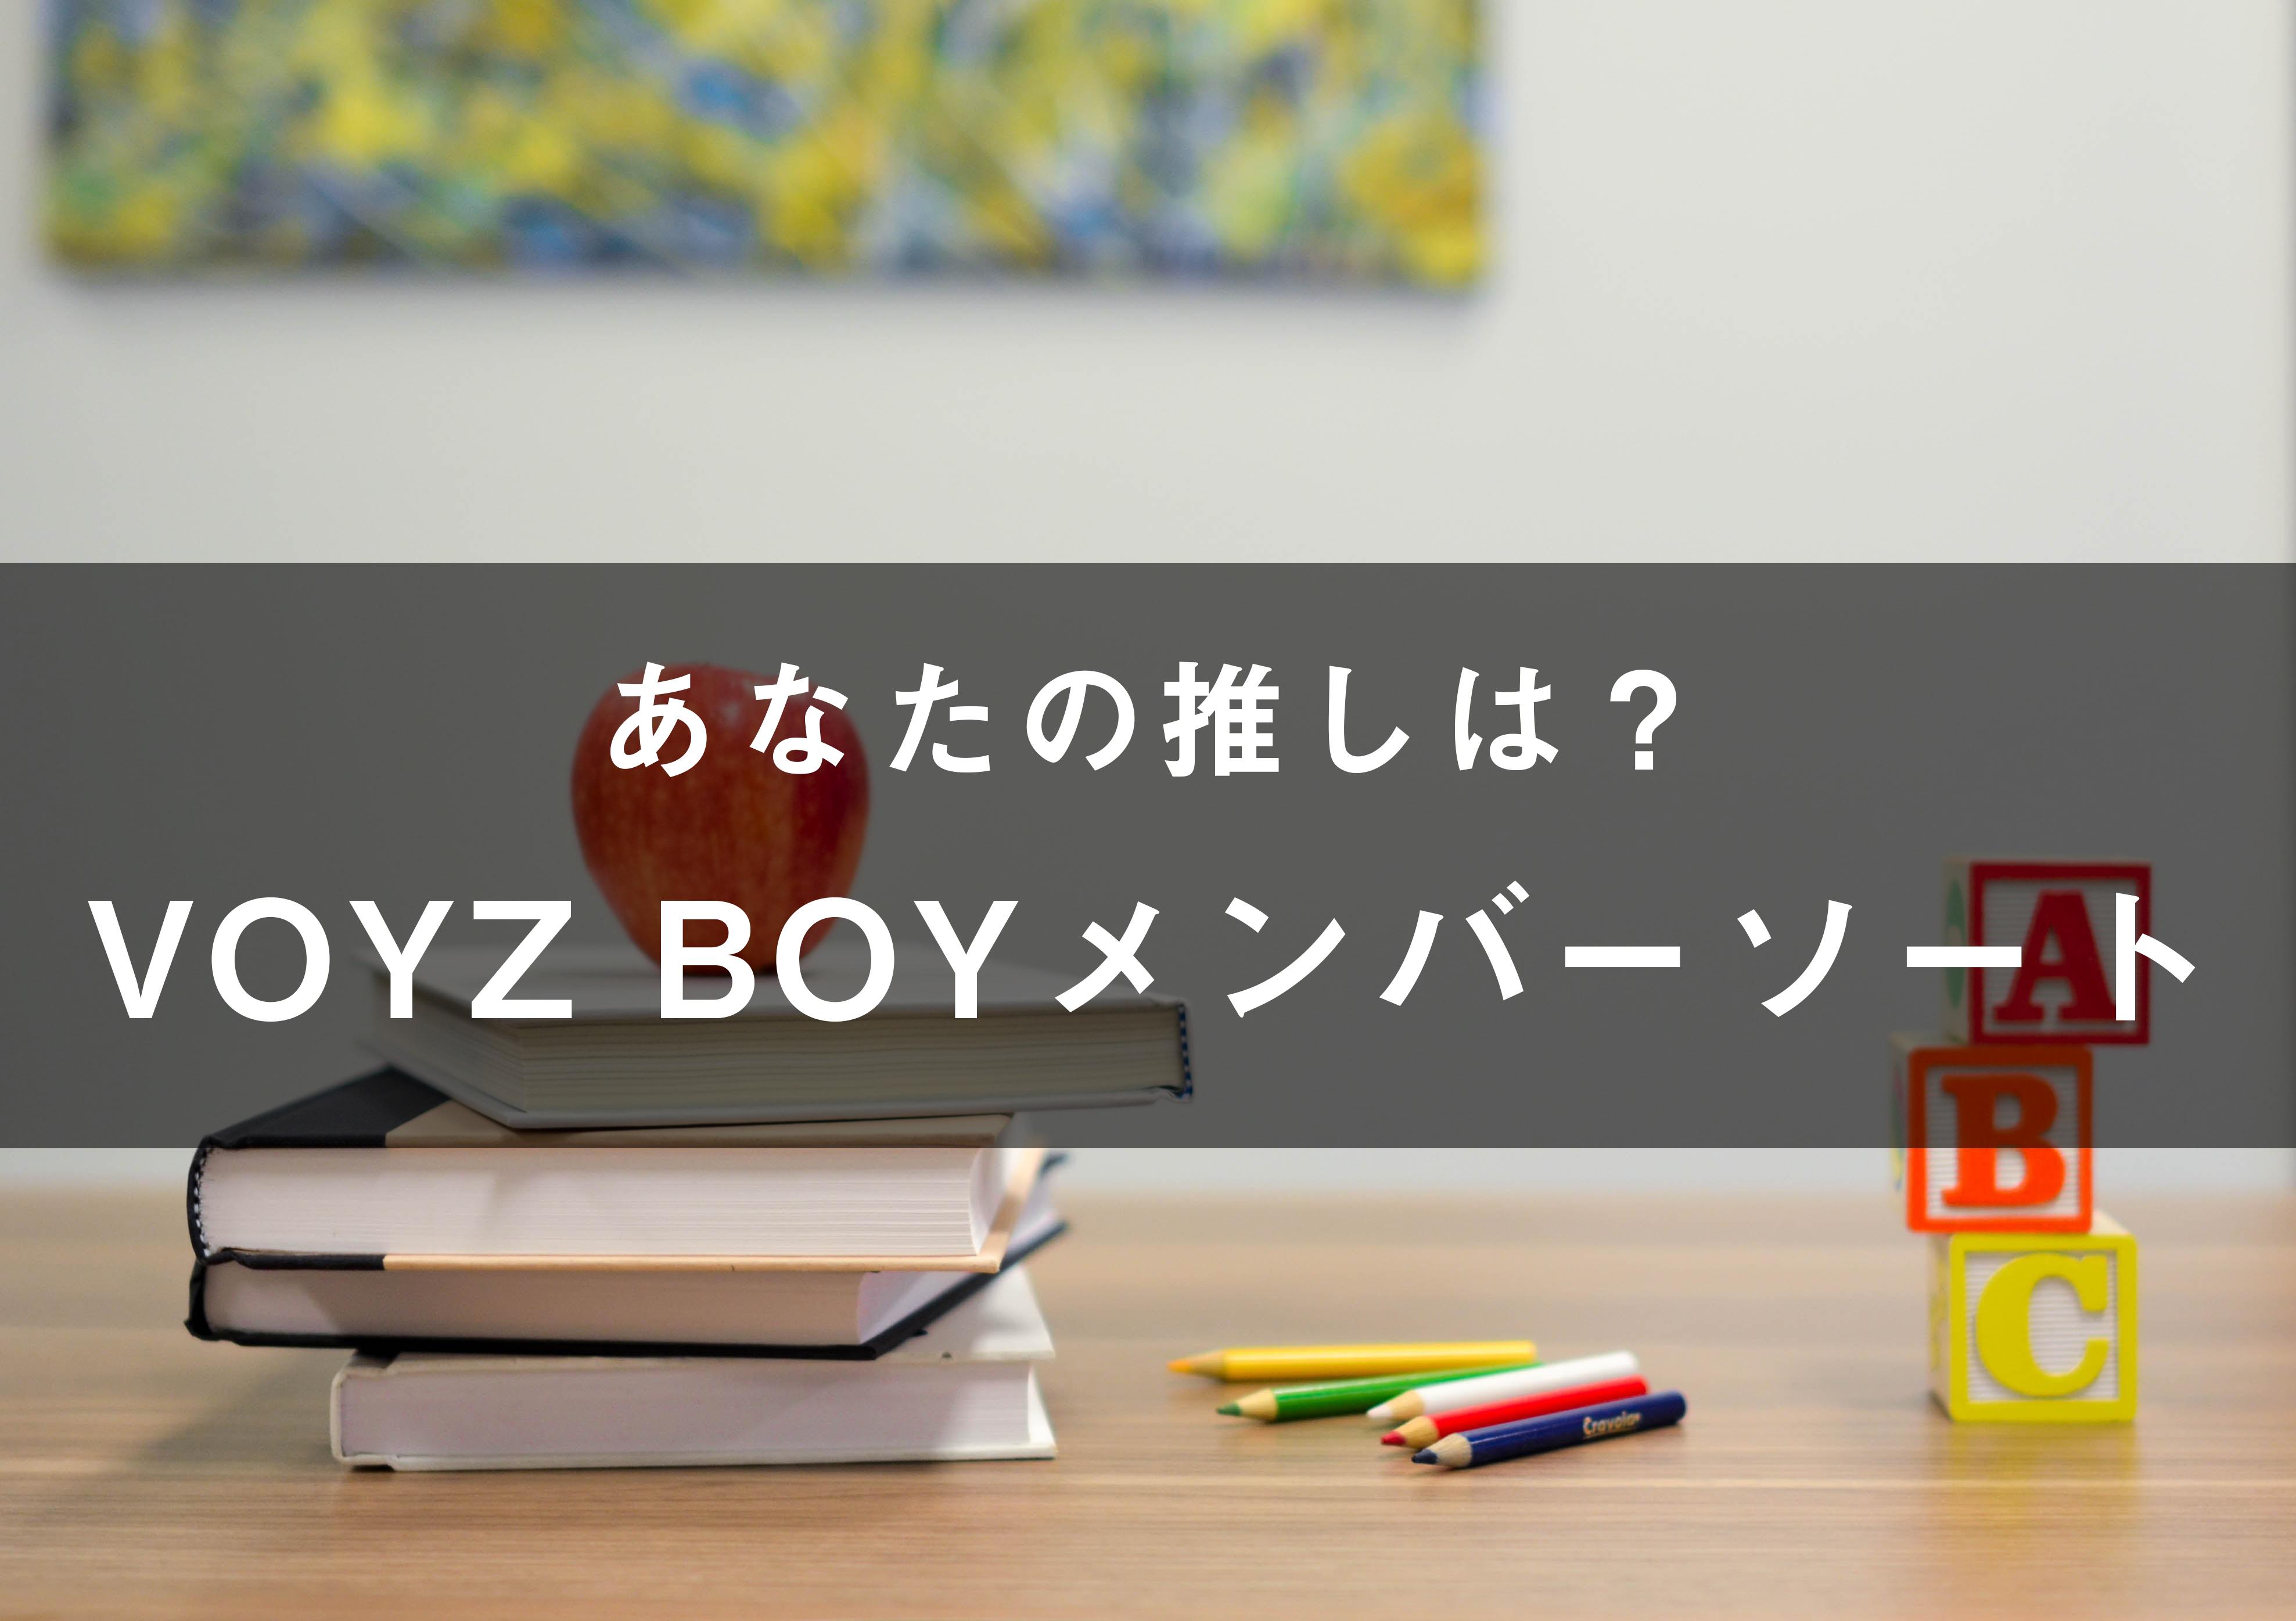 「VOYZ BOY」のメンバーソート(画像付き)